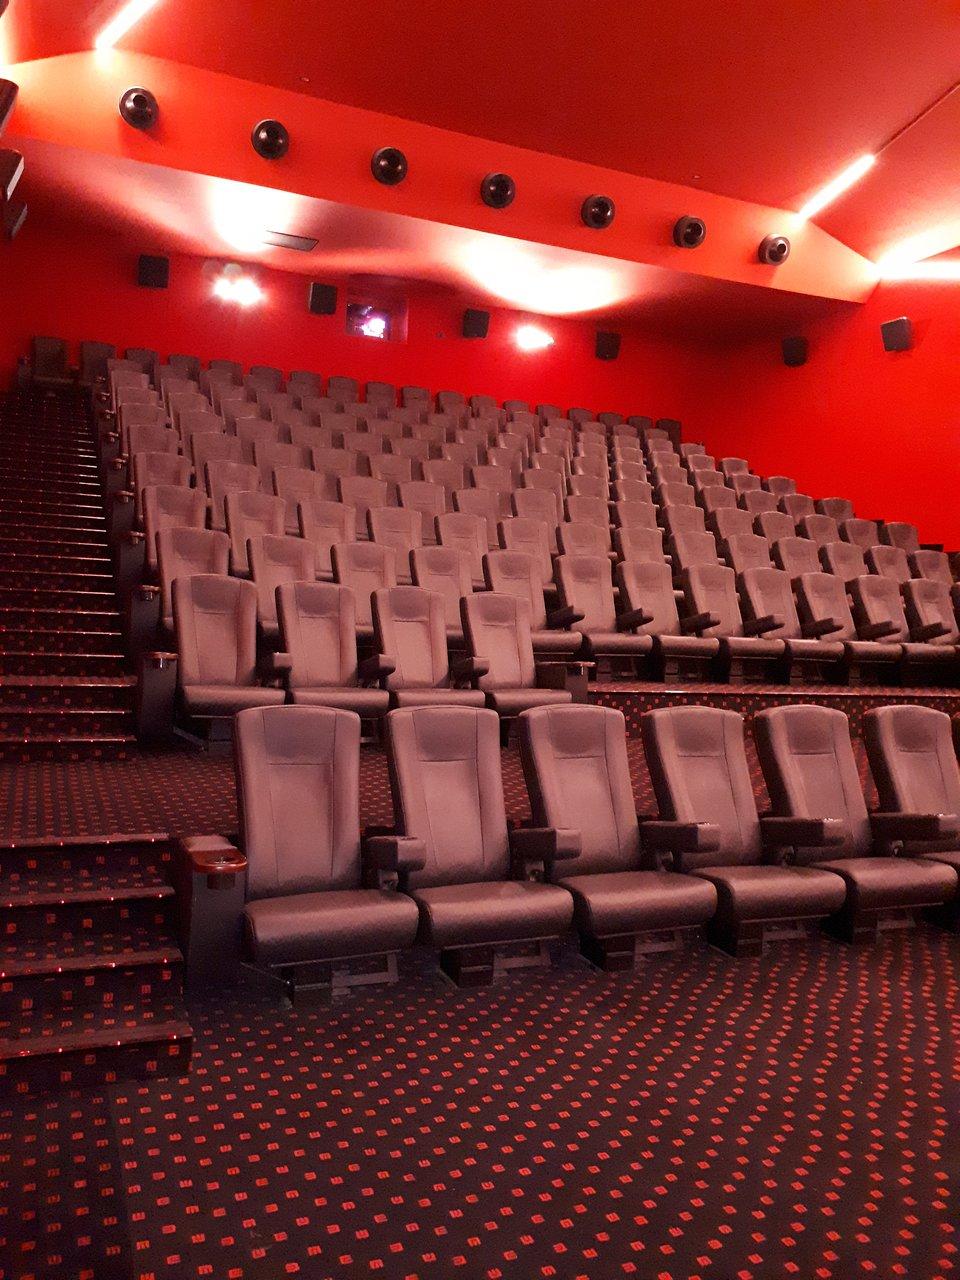 Cinema Megarama (Ecole-Valentin) - 10 All You Need to Know